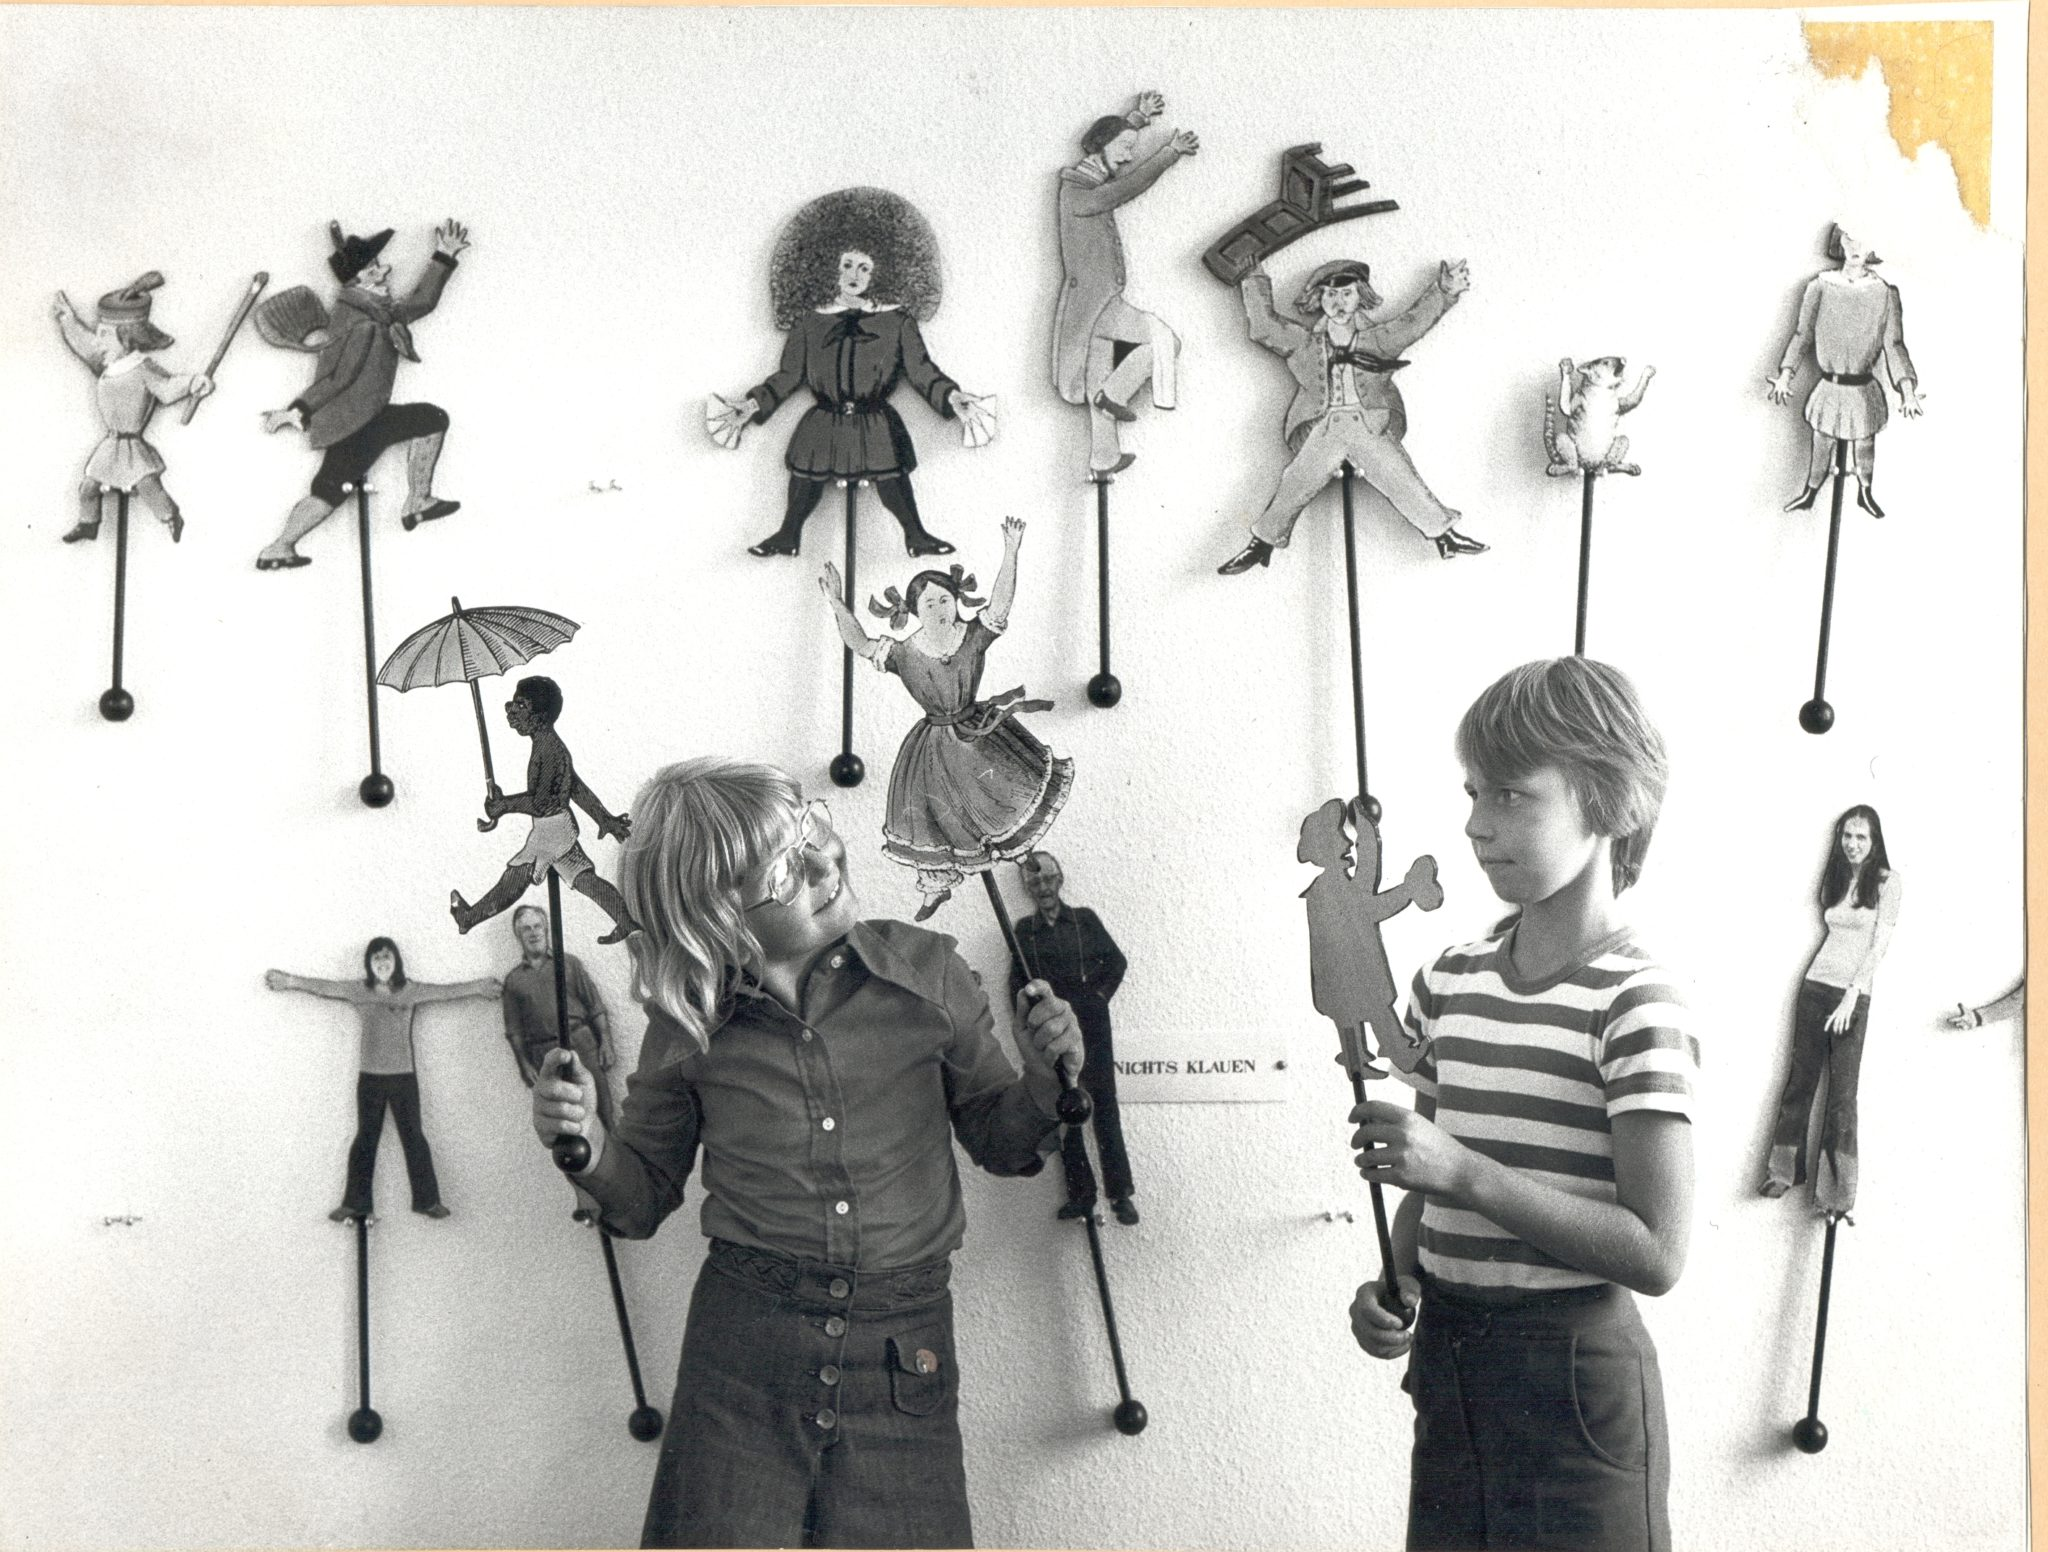 Kindermuseum Frankfurt - Struwwelpeter garstig, macht die Kinder artig? (1976)